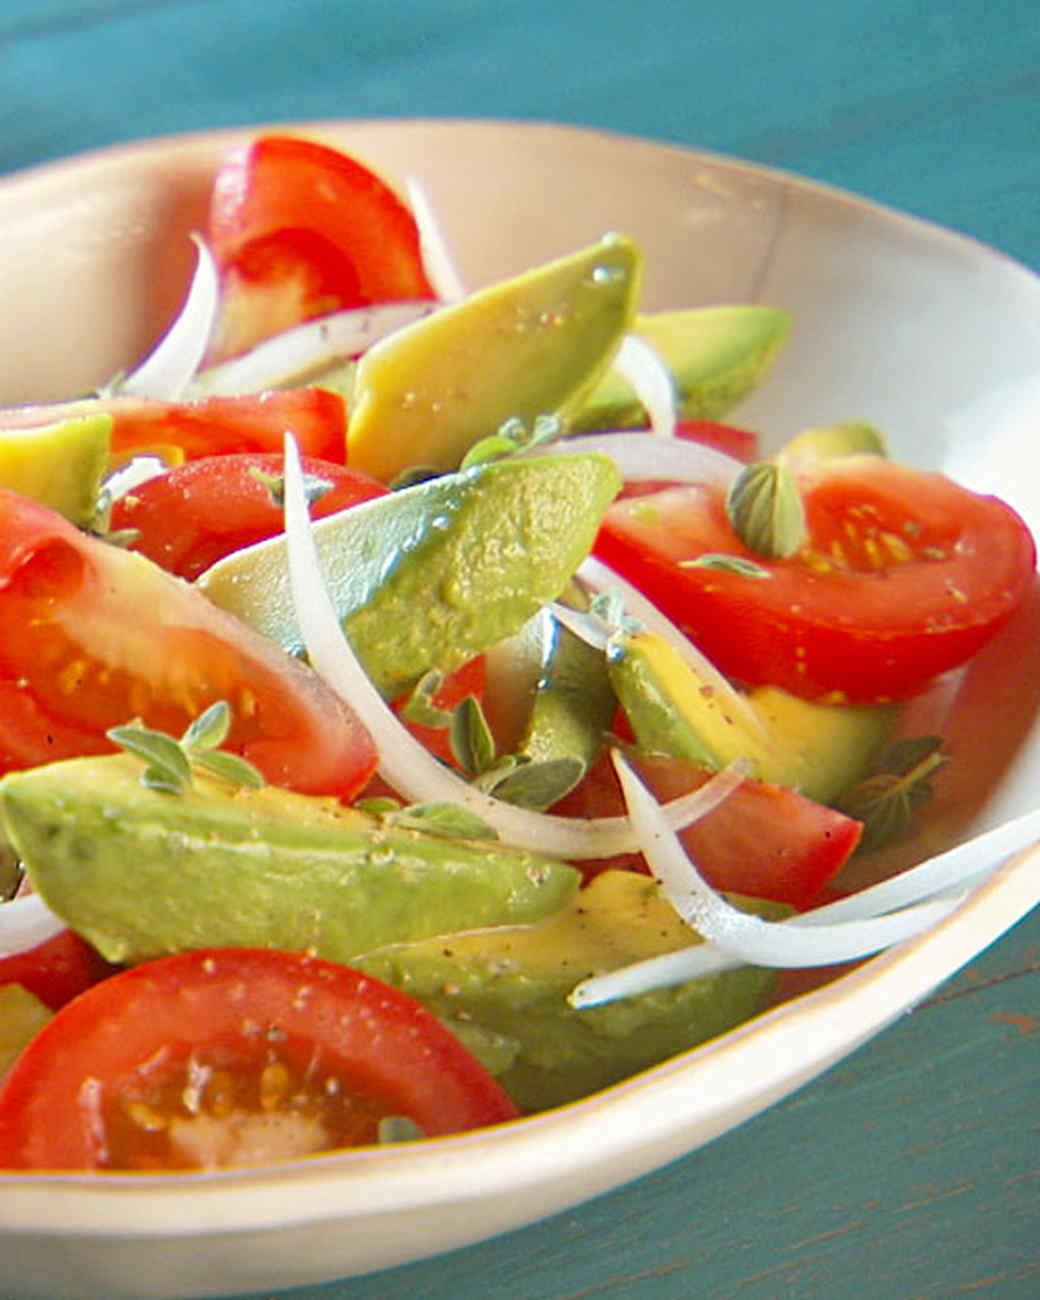 mh_1032_tomato_avocado_salad.jpg